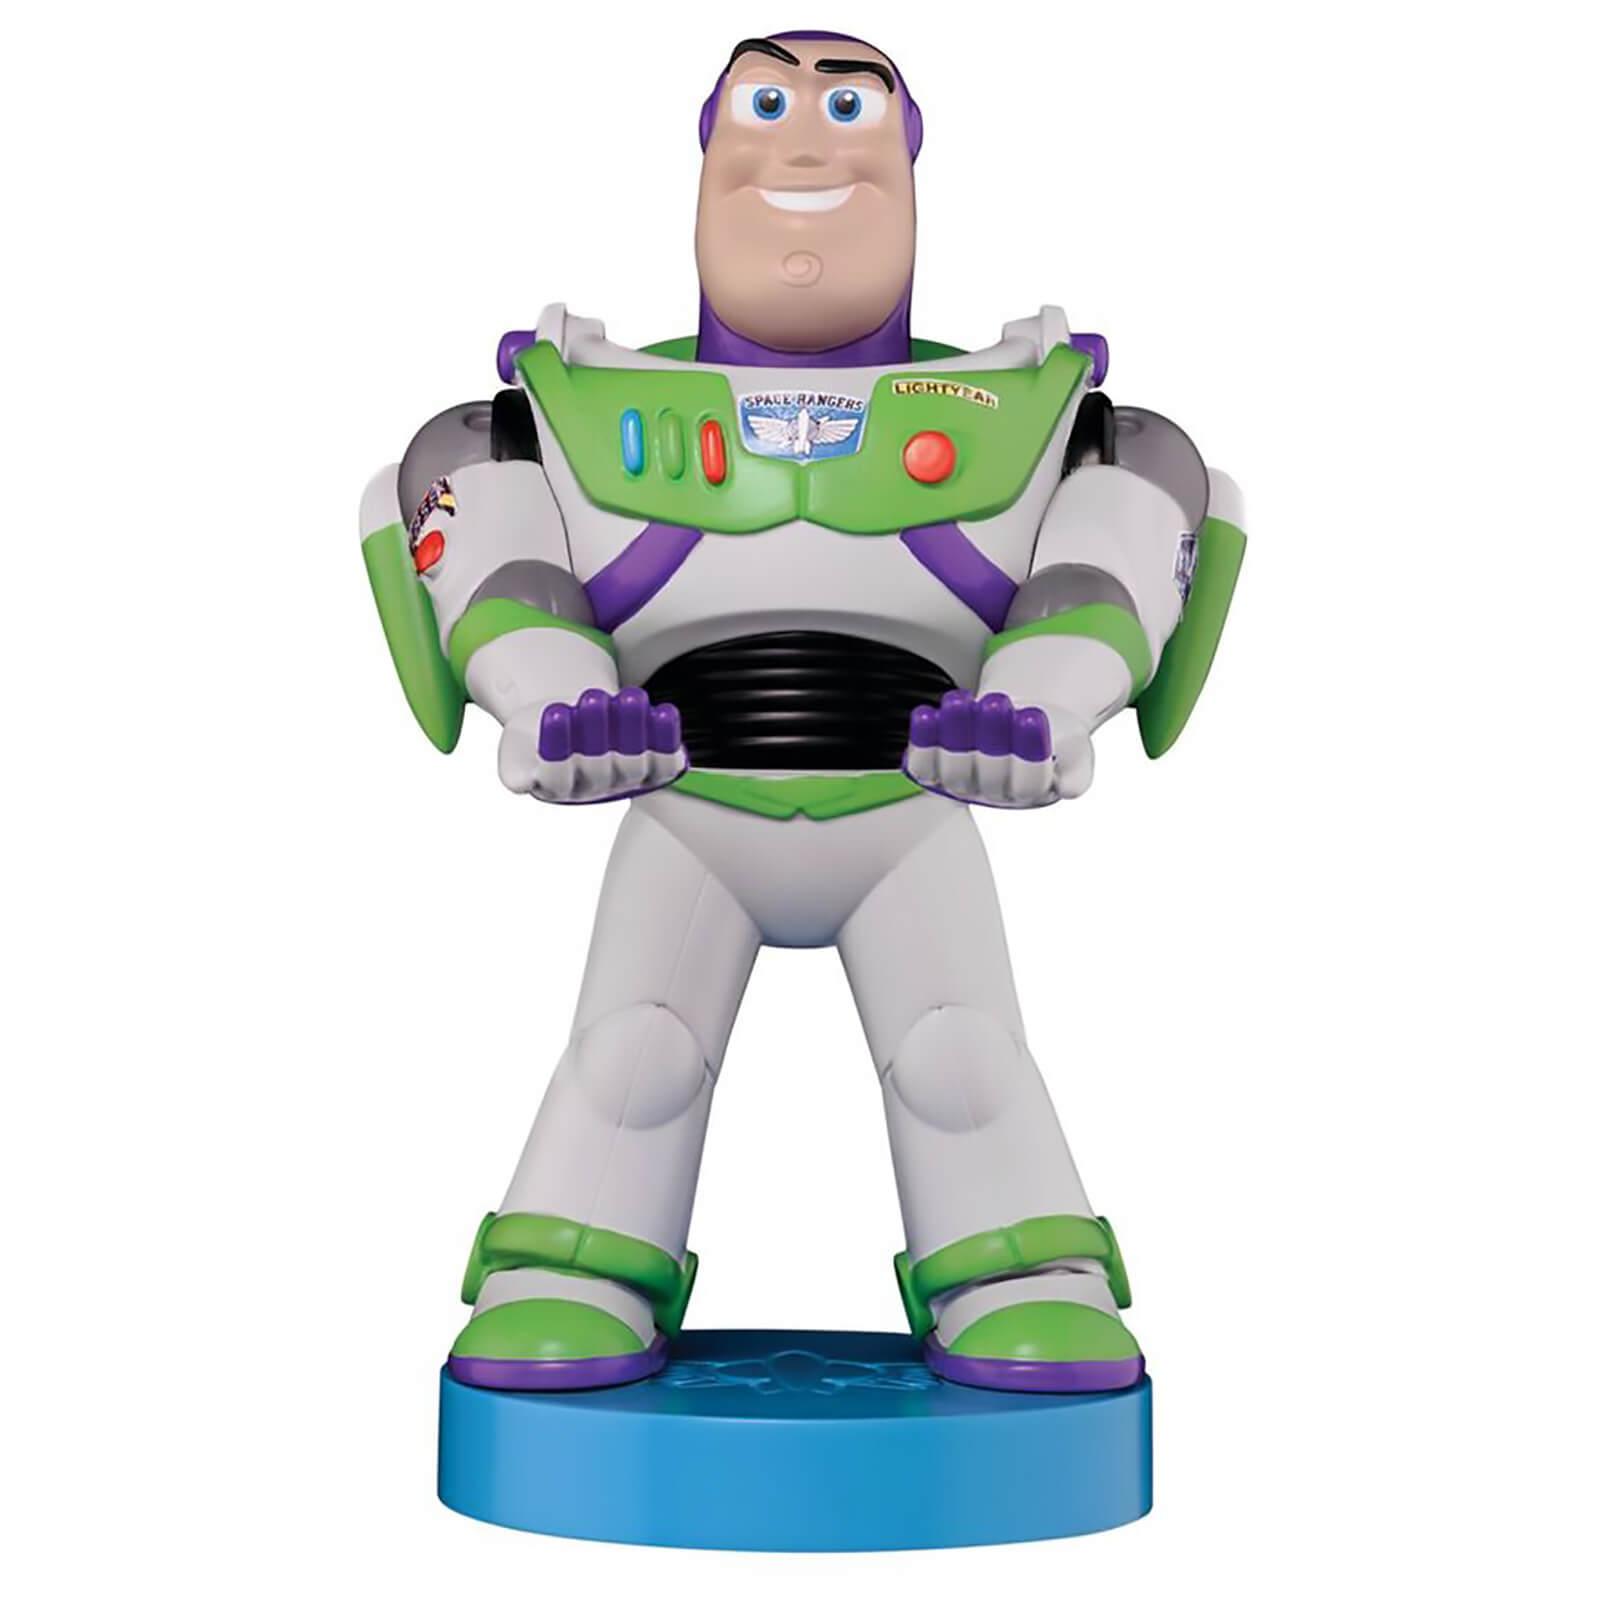 Sujetamóviles de Buzz Lightyear